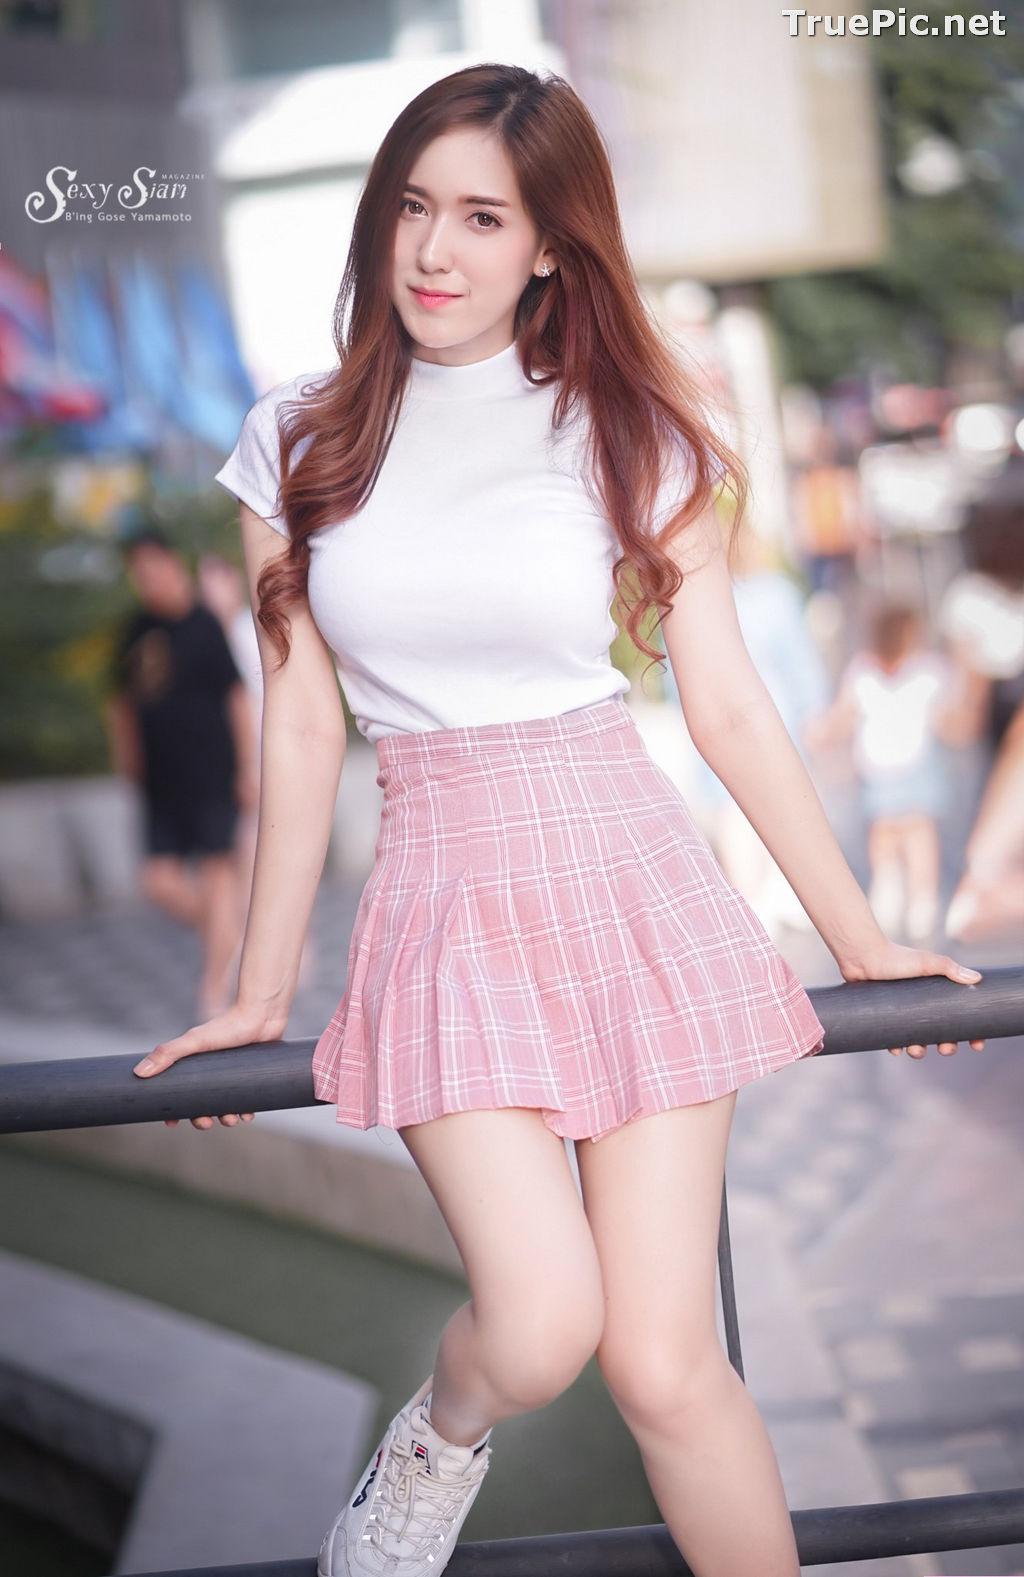 Image Thailand Model - Jarunya Boonya - Pink Love Love Love - TruePic.net - Picture-1